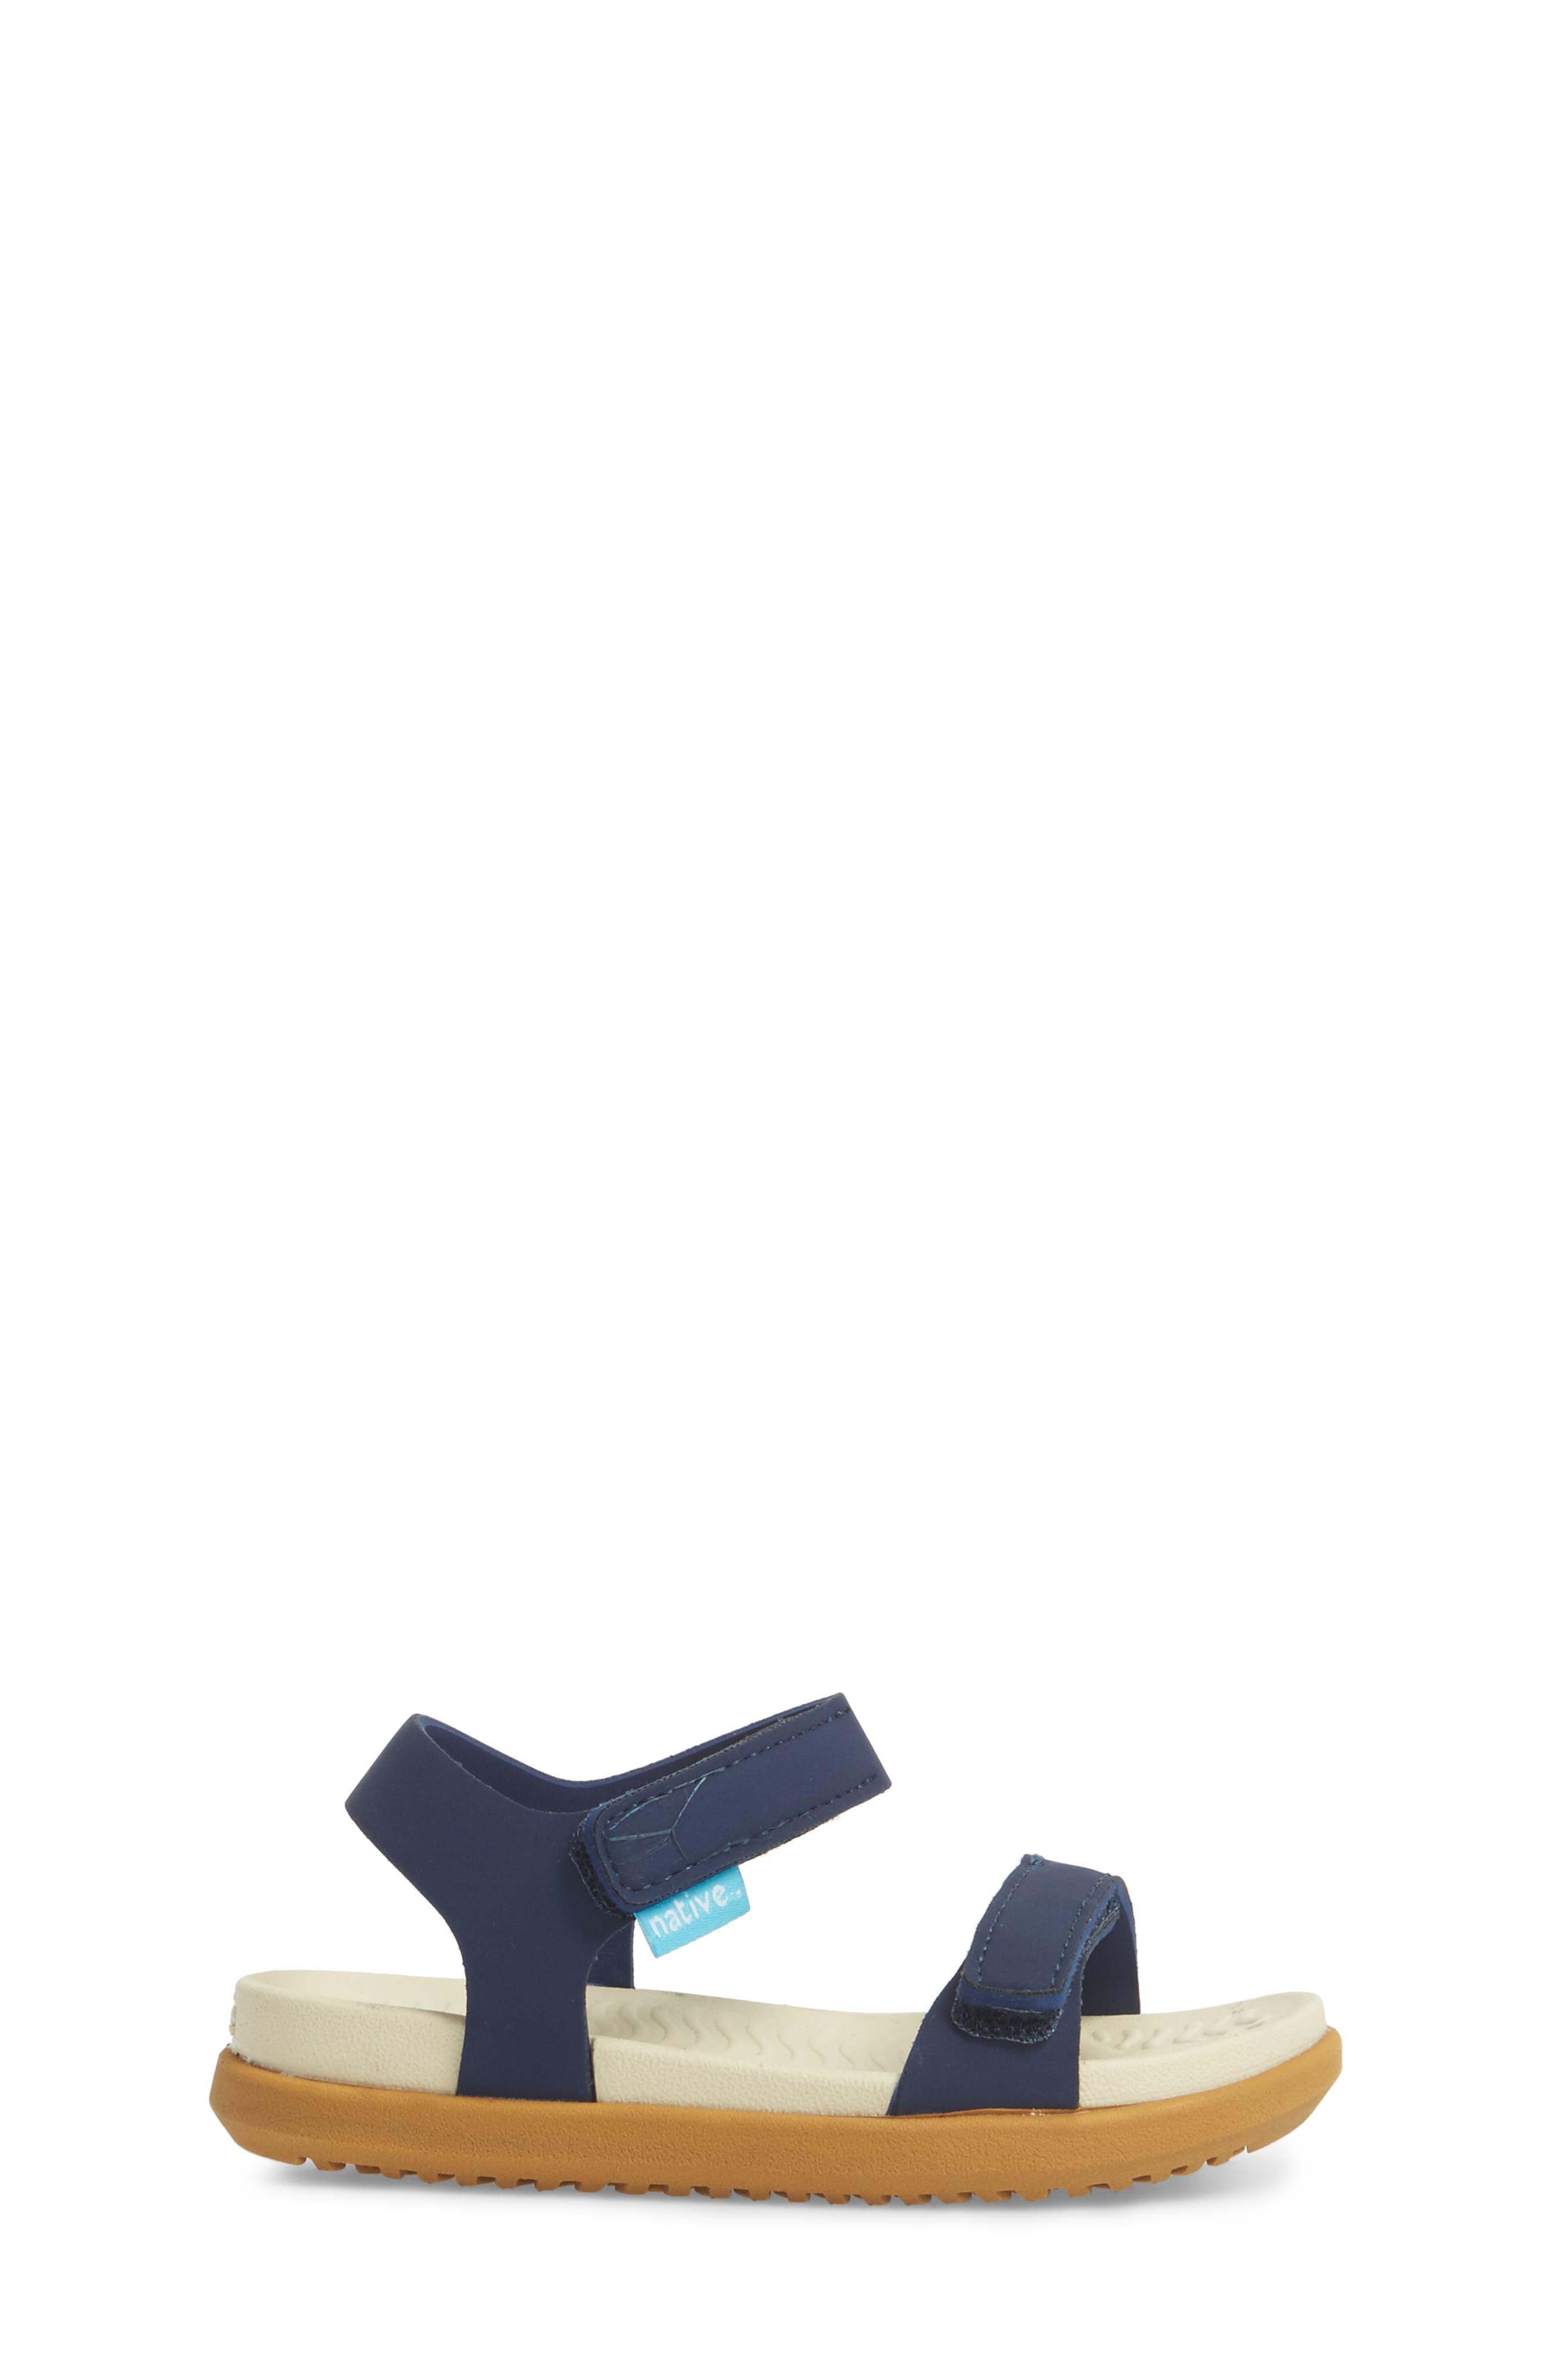 Charley Child Waterproof Flat Sandal,                             Alternate thumbnail 3, color,                             Blue/ Bone White/ Toffee